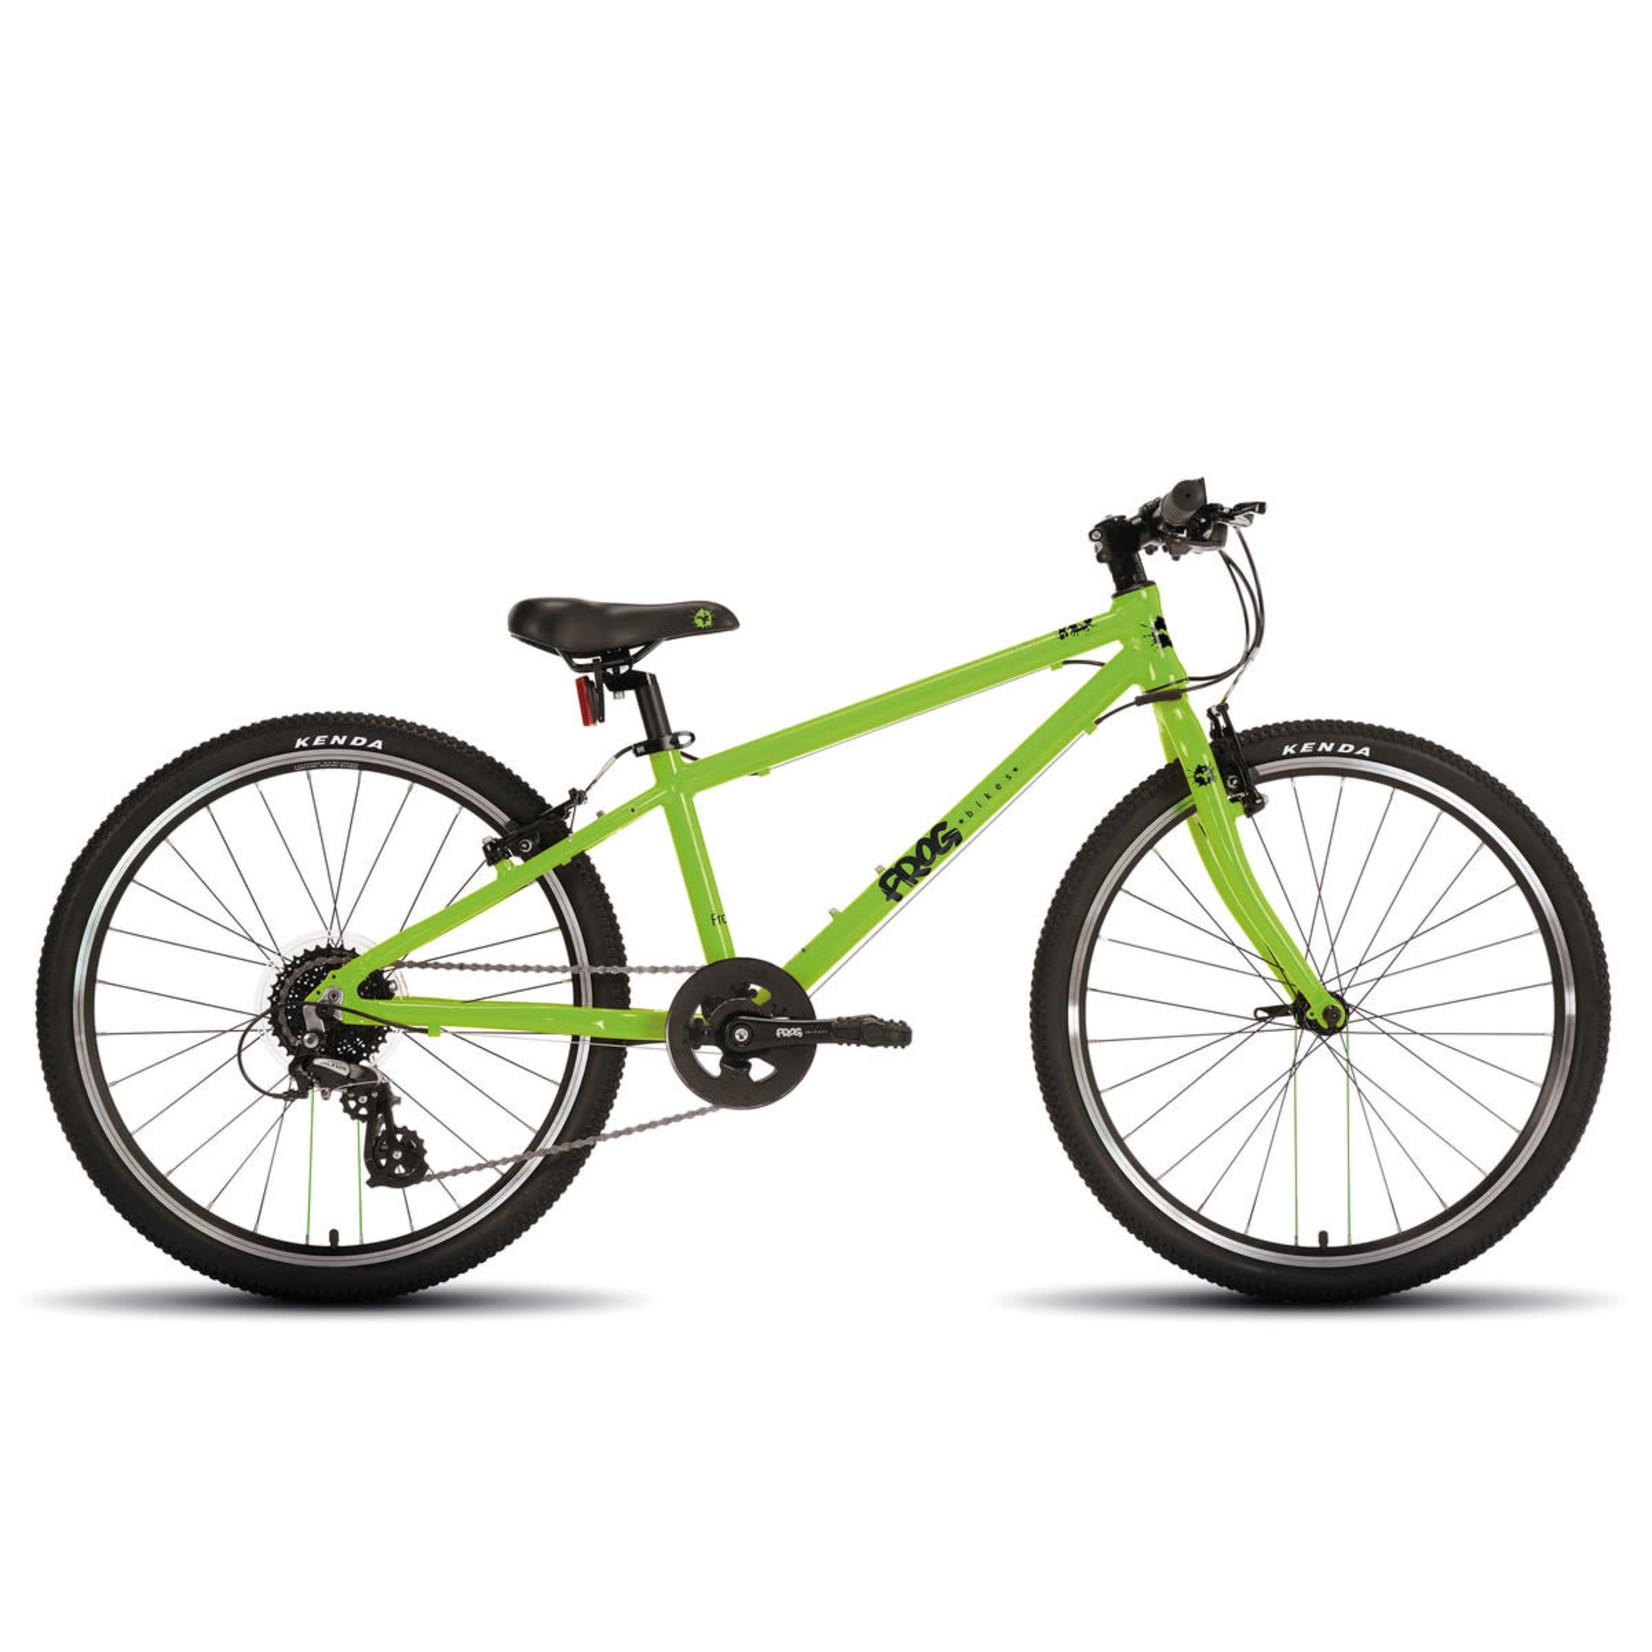 Frog Bikes Frog Bikes, Hybrid, Frog 62